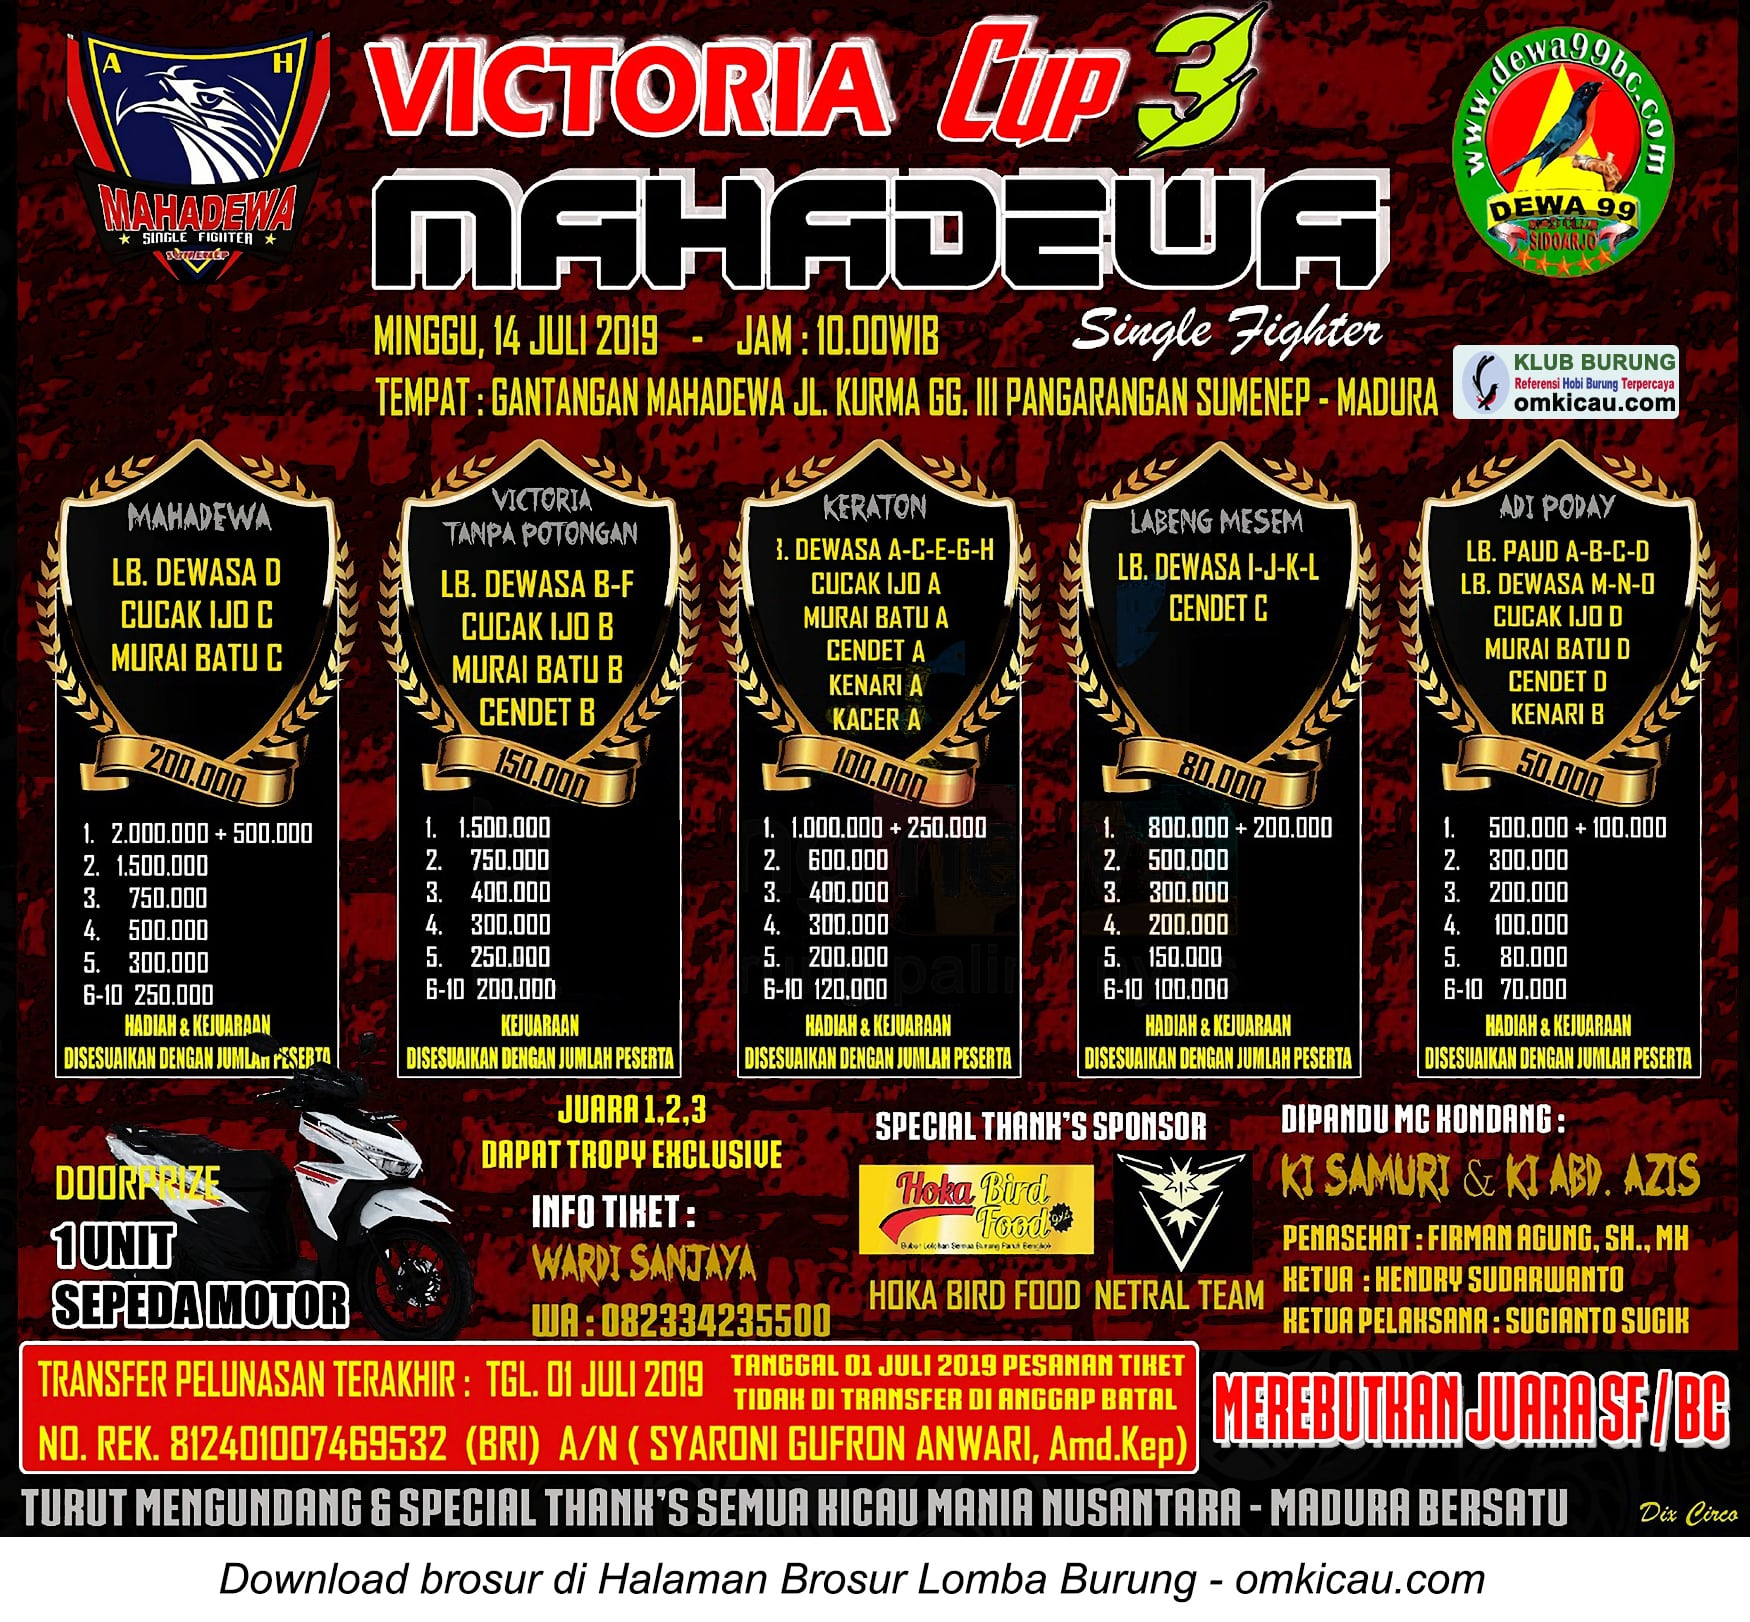 Victoria Cup 3 Mahadewa SF